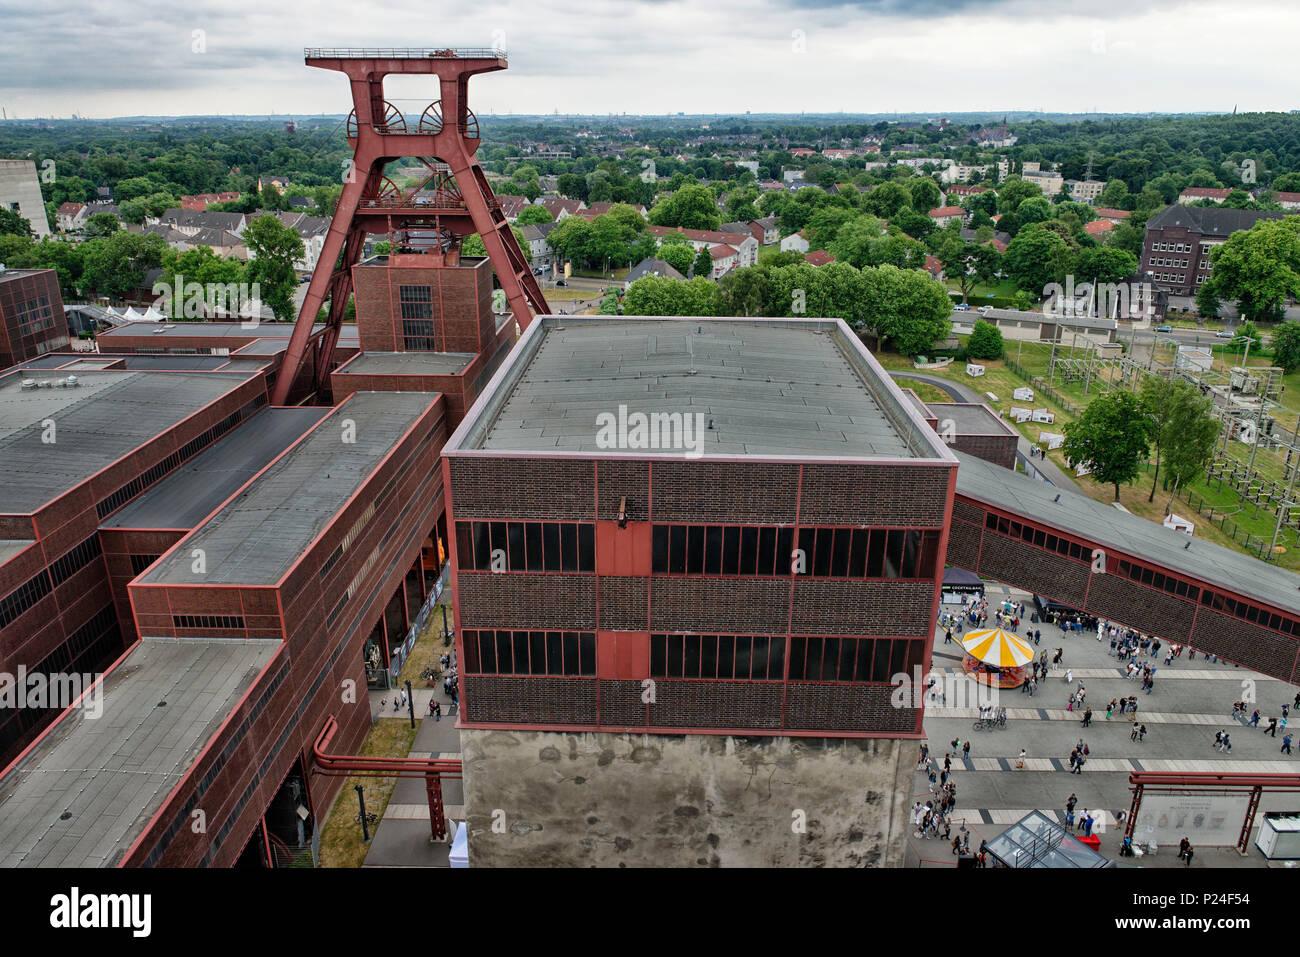 Zollverein Coal Mine Industrial Complex, shaft XII, UNESCO world heritage, Essen, North Rhine-Westphalia, Germany - Stock Image